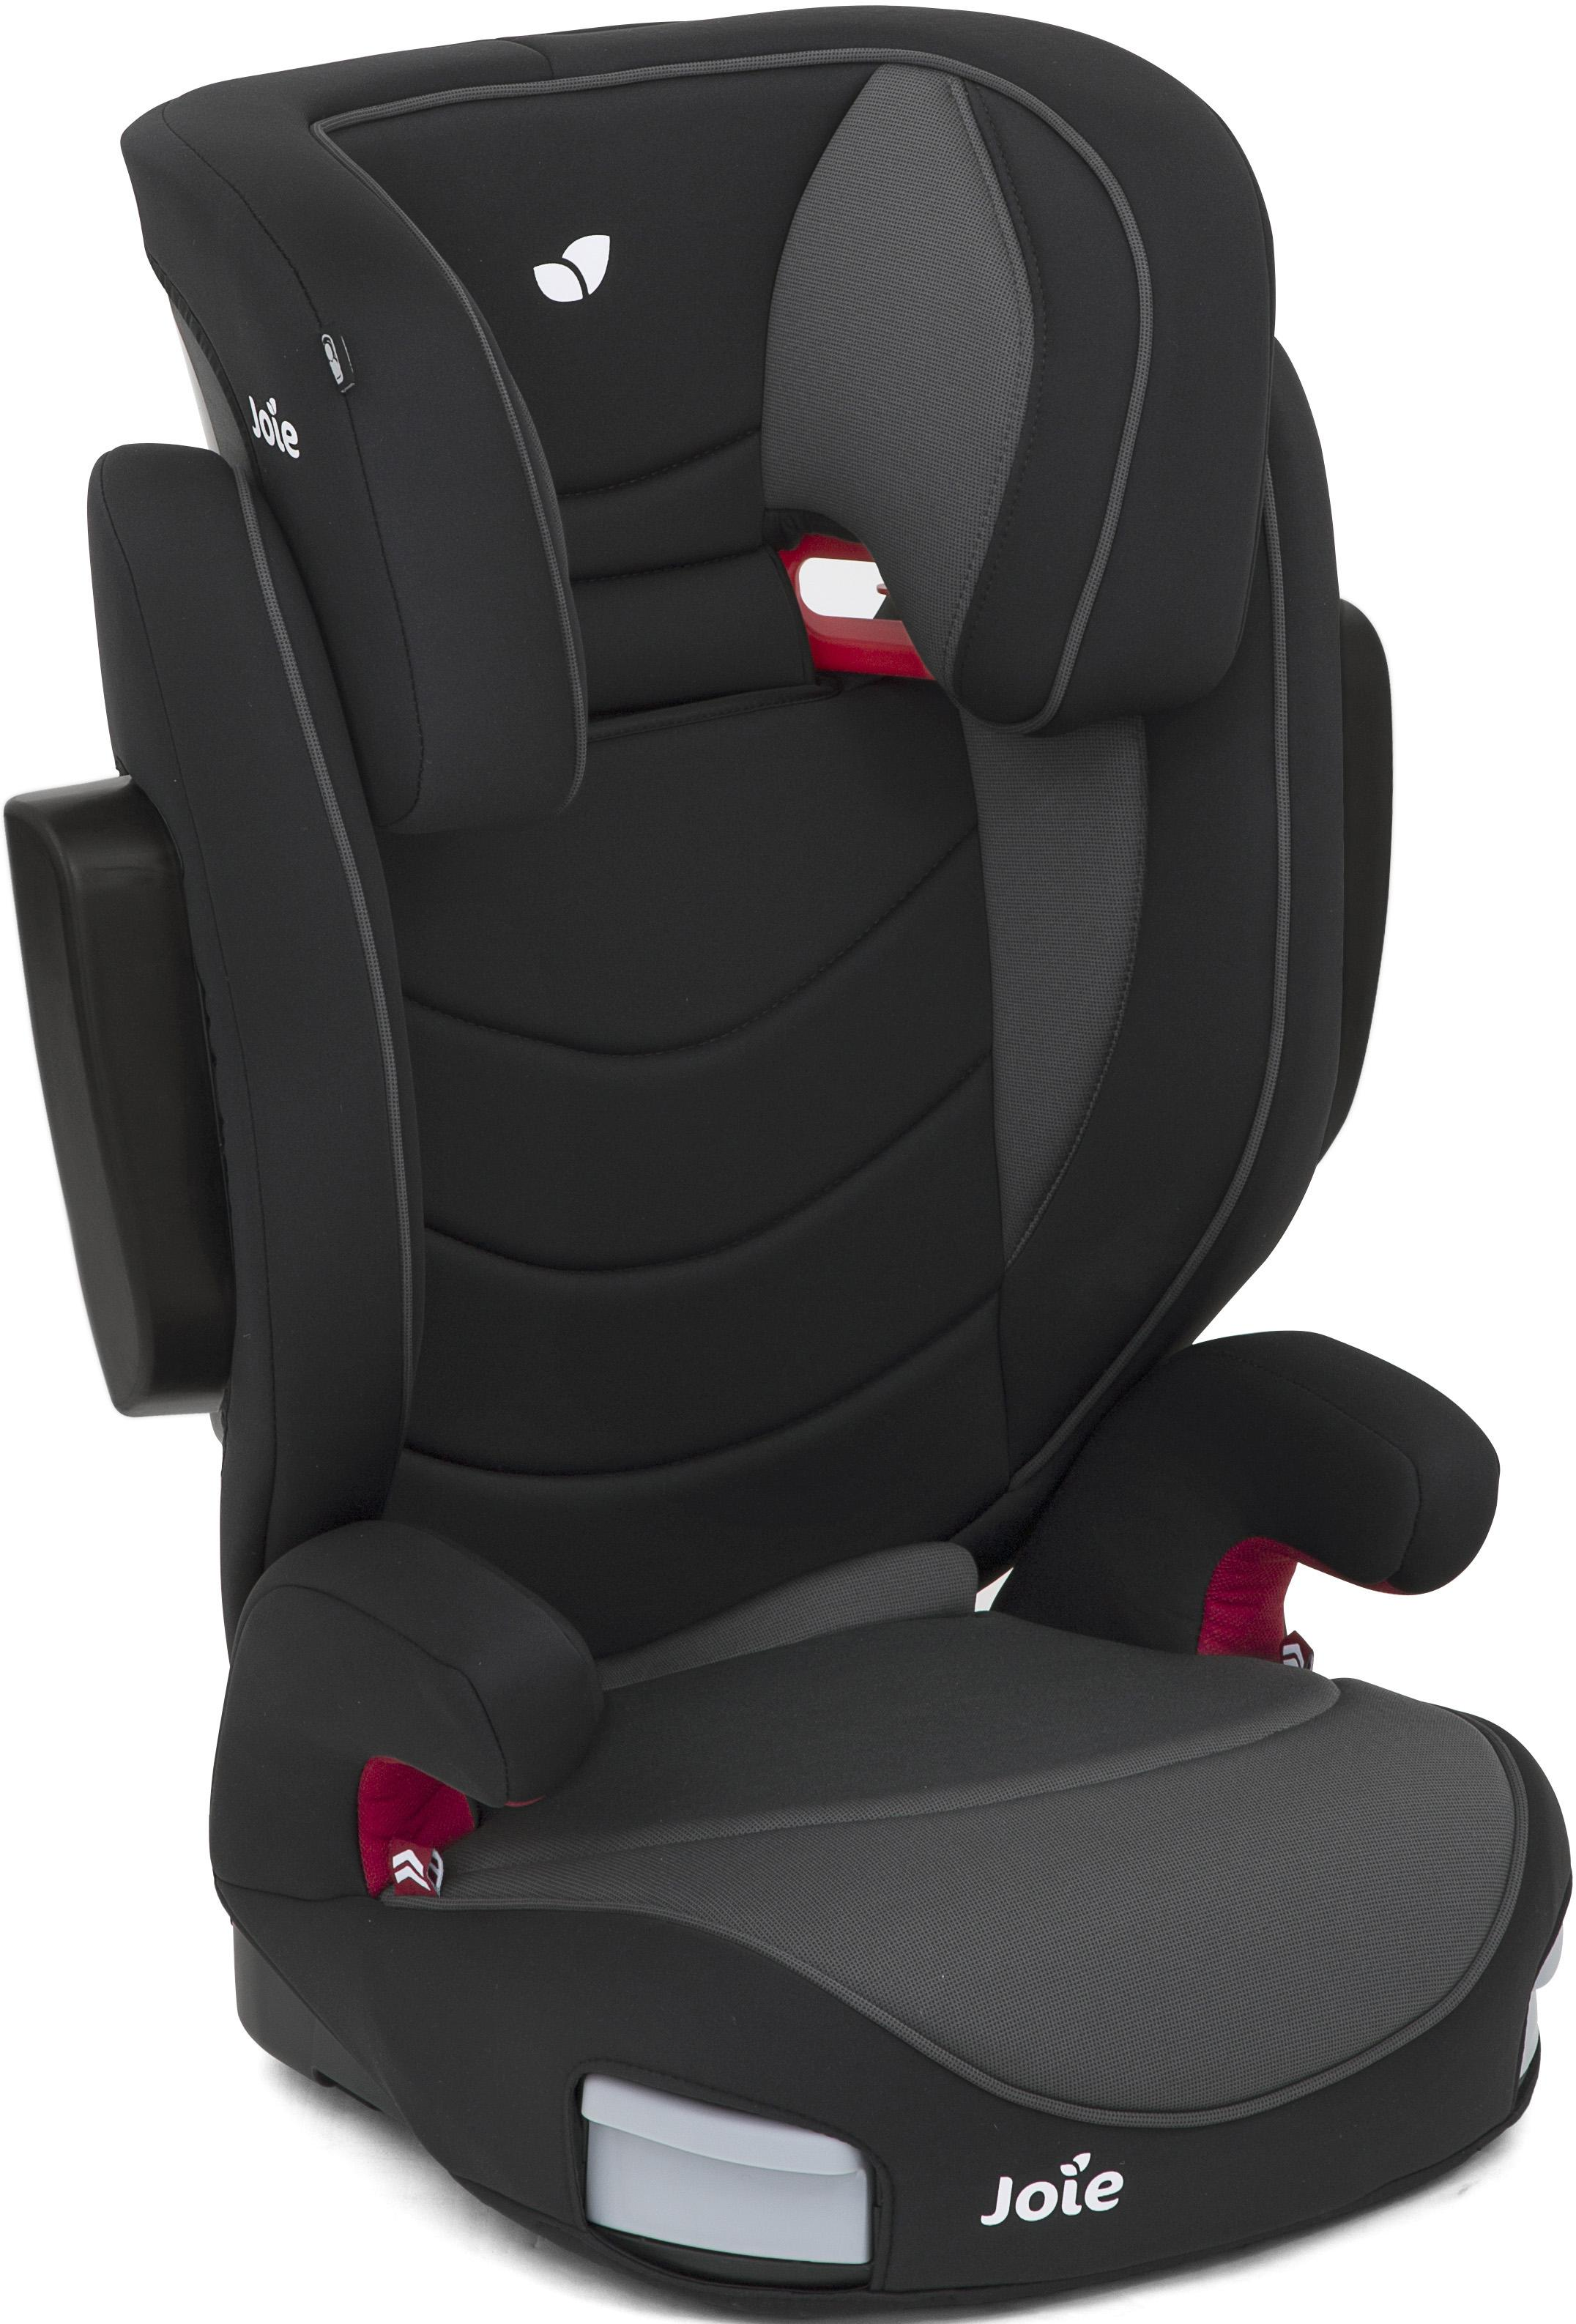 Joie Trillo LX 2/3 Child Car Seat